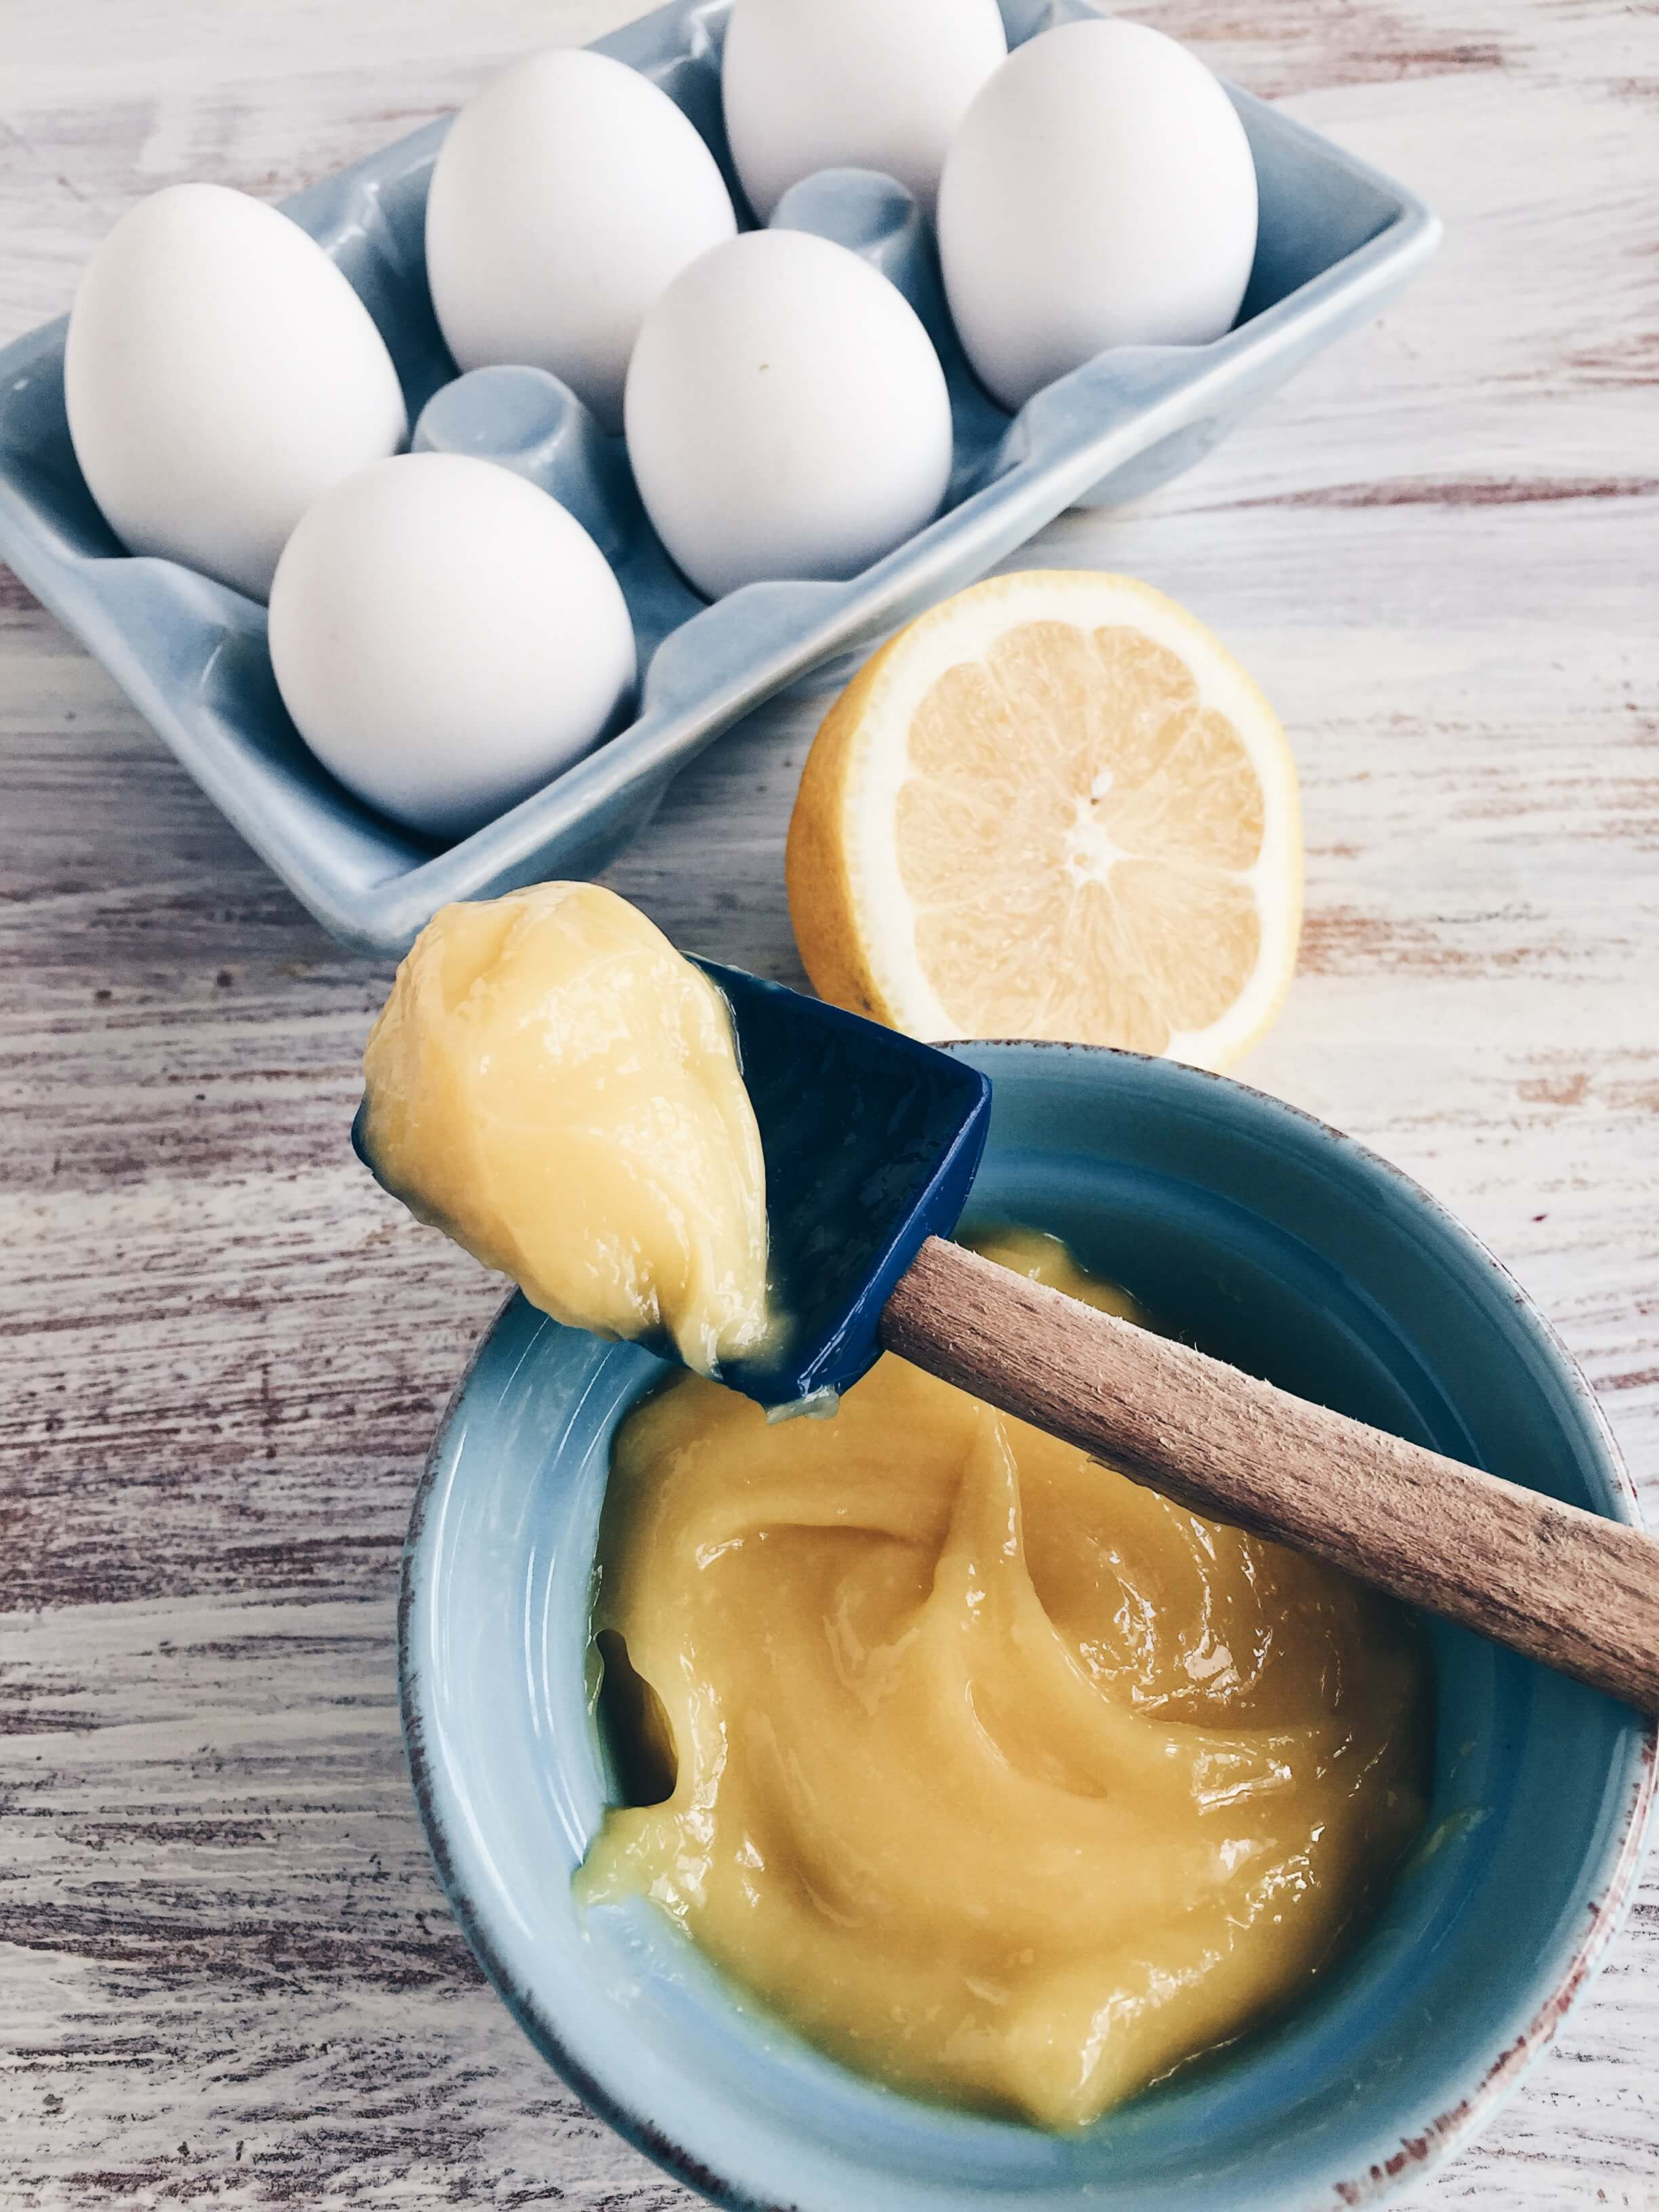 Fresh yolk-only lemon curd by The Messy Baker